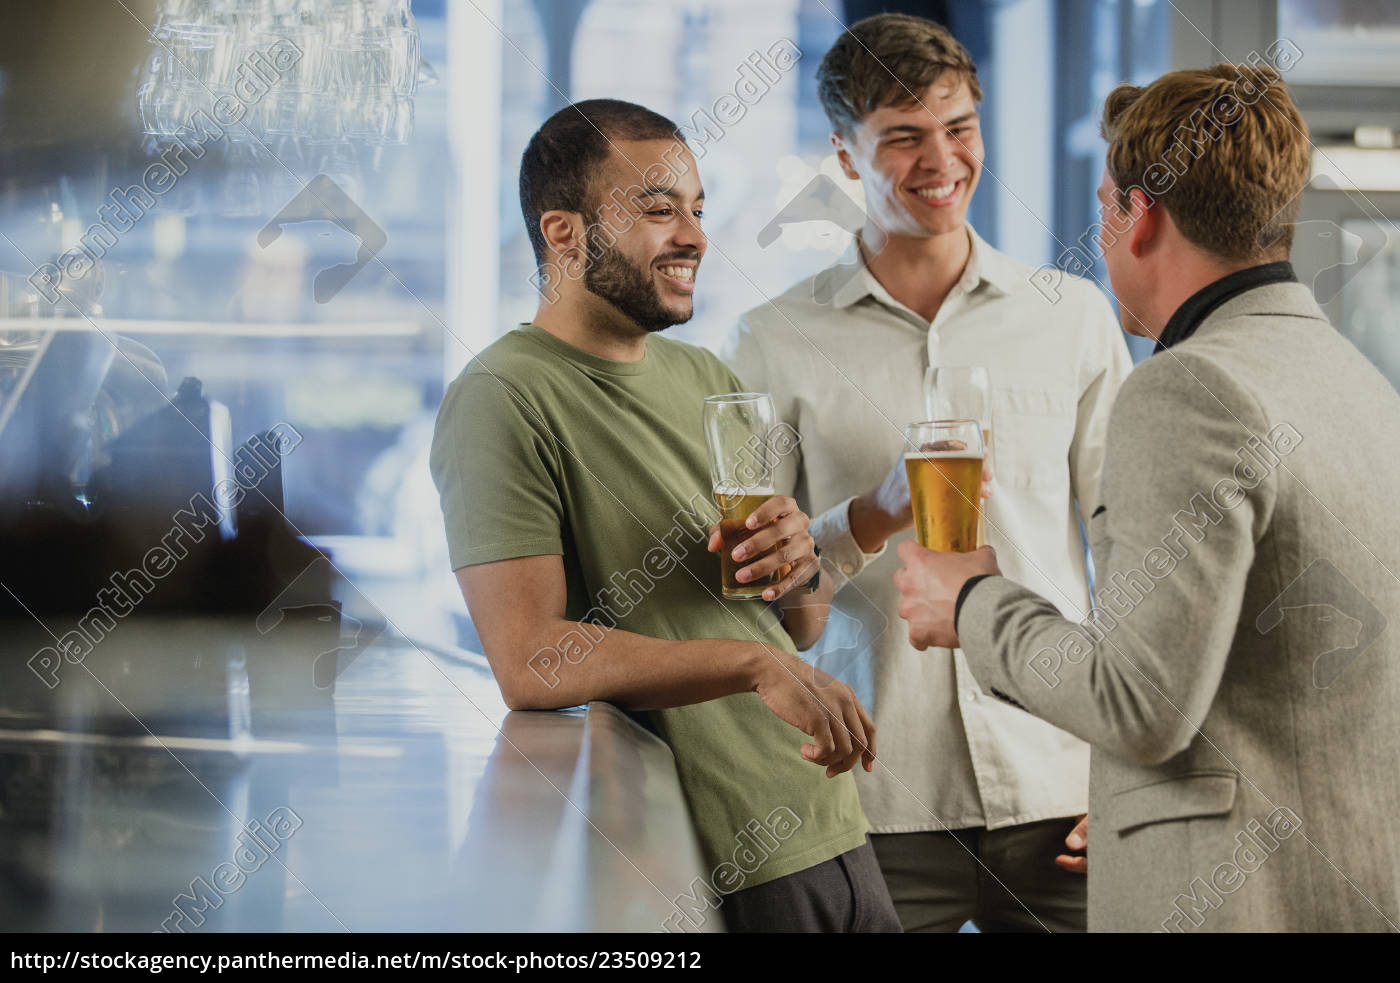 enjoying, drinks, after, work - 23509212